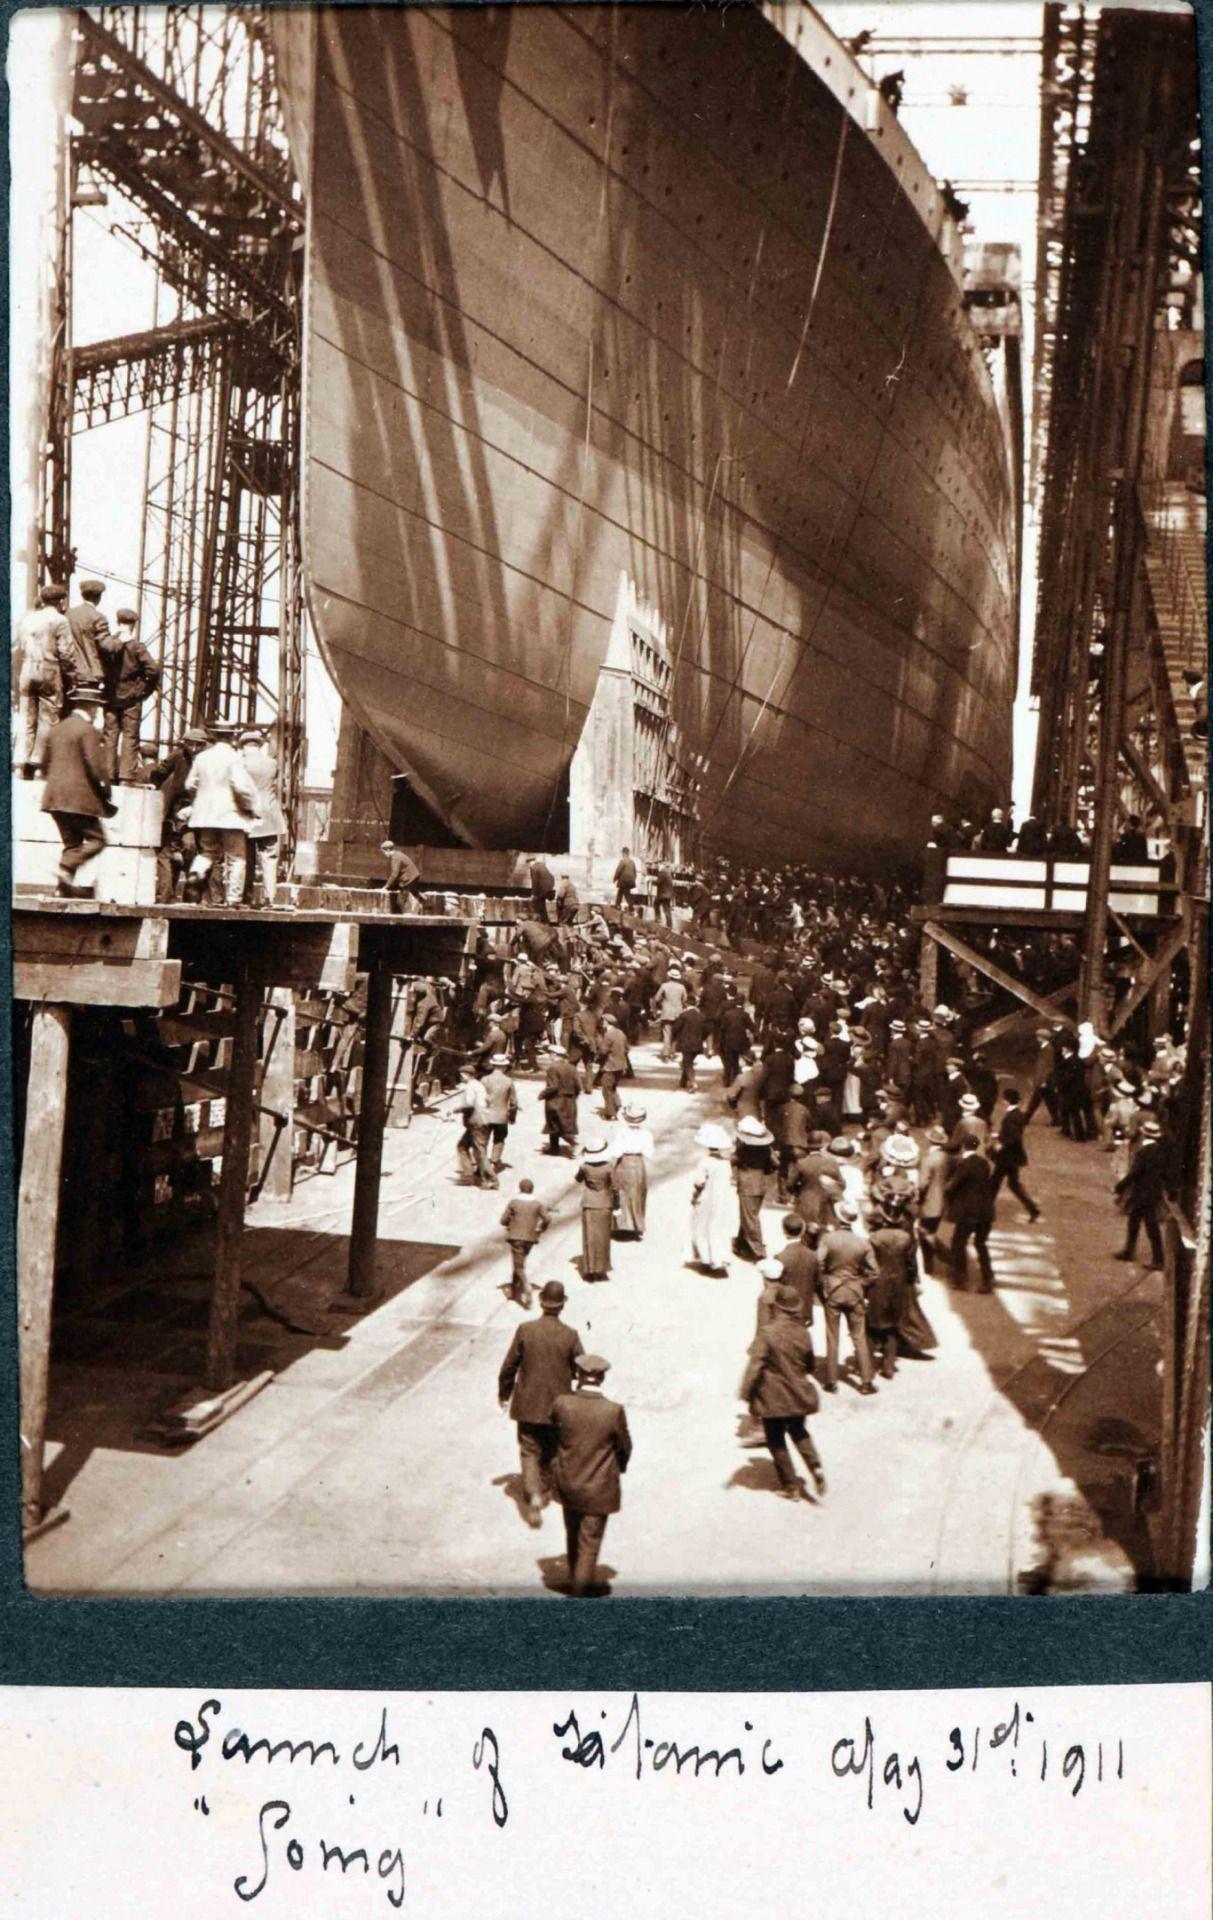 Rmstitanicfacts Titanic Ship Titanic History Titanic